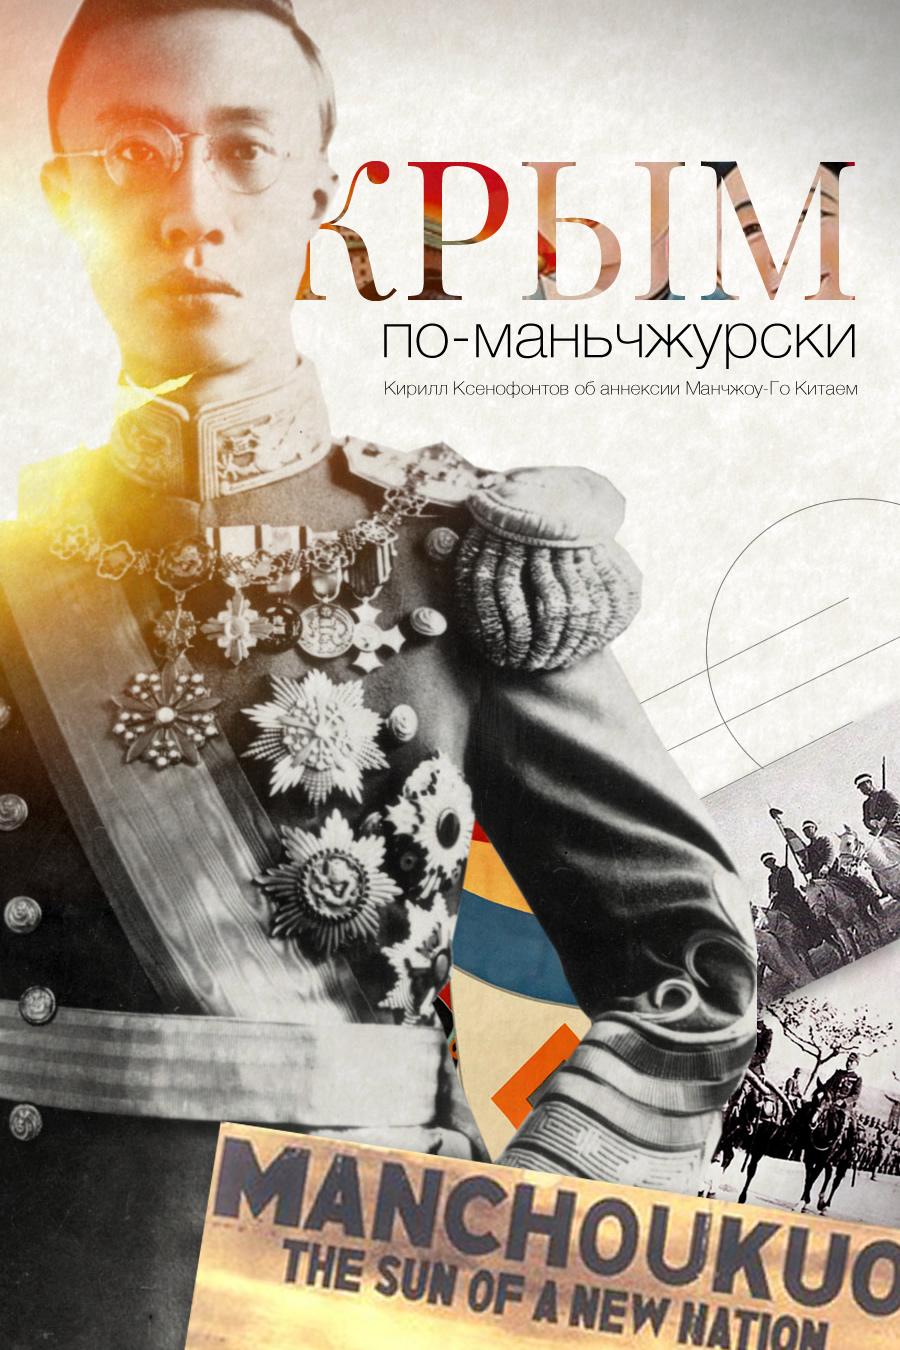 http://sputnikipogrom.com/asia/10209/chinese-crimea/